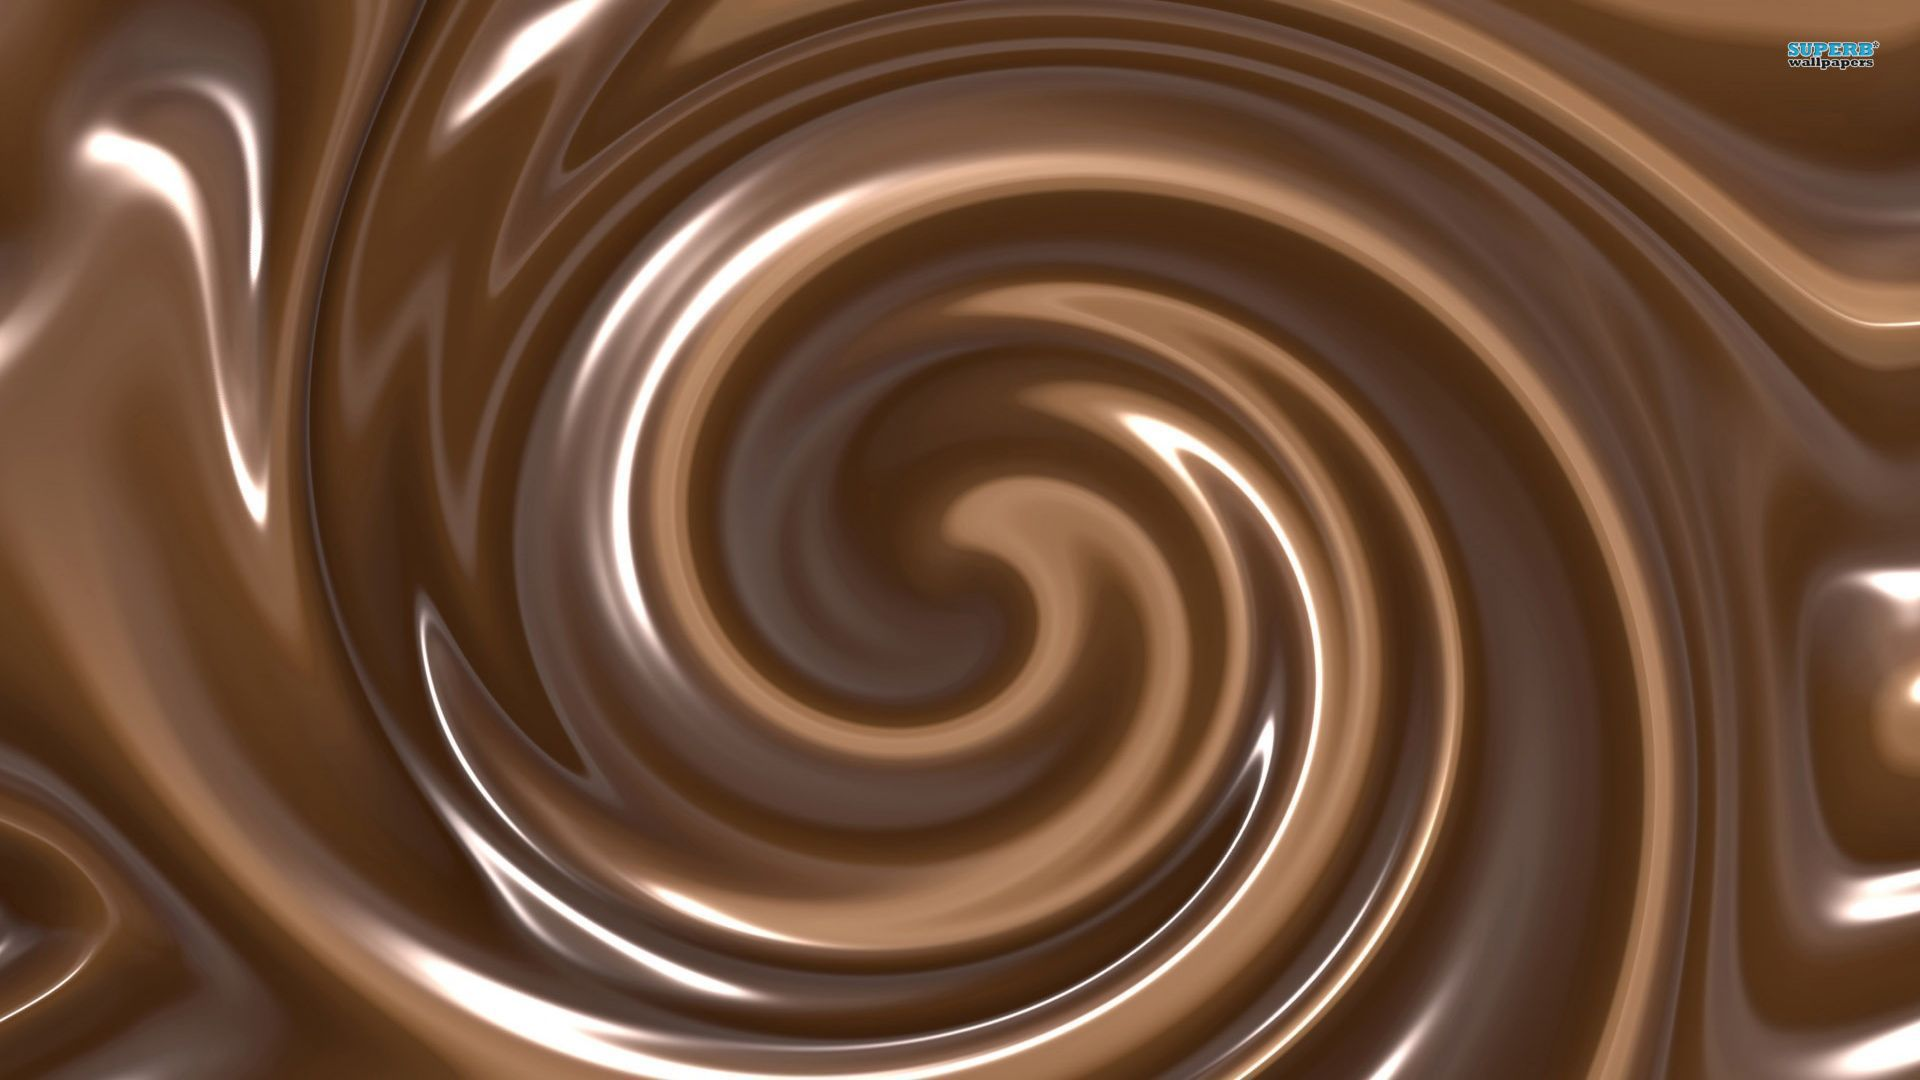 Fondos De Pantalla De Chocolates: Chocolate Wallpapers, Pictures, Images